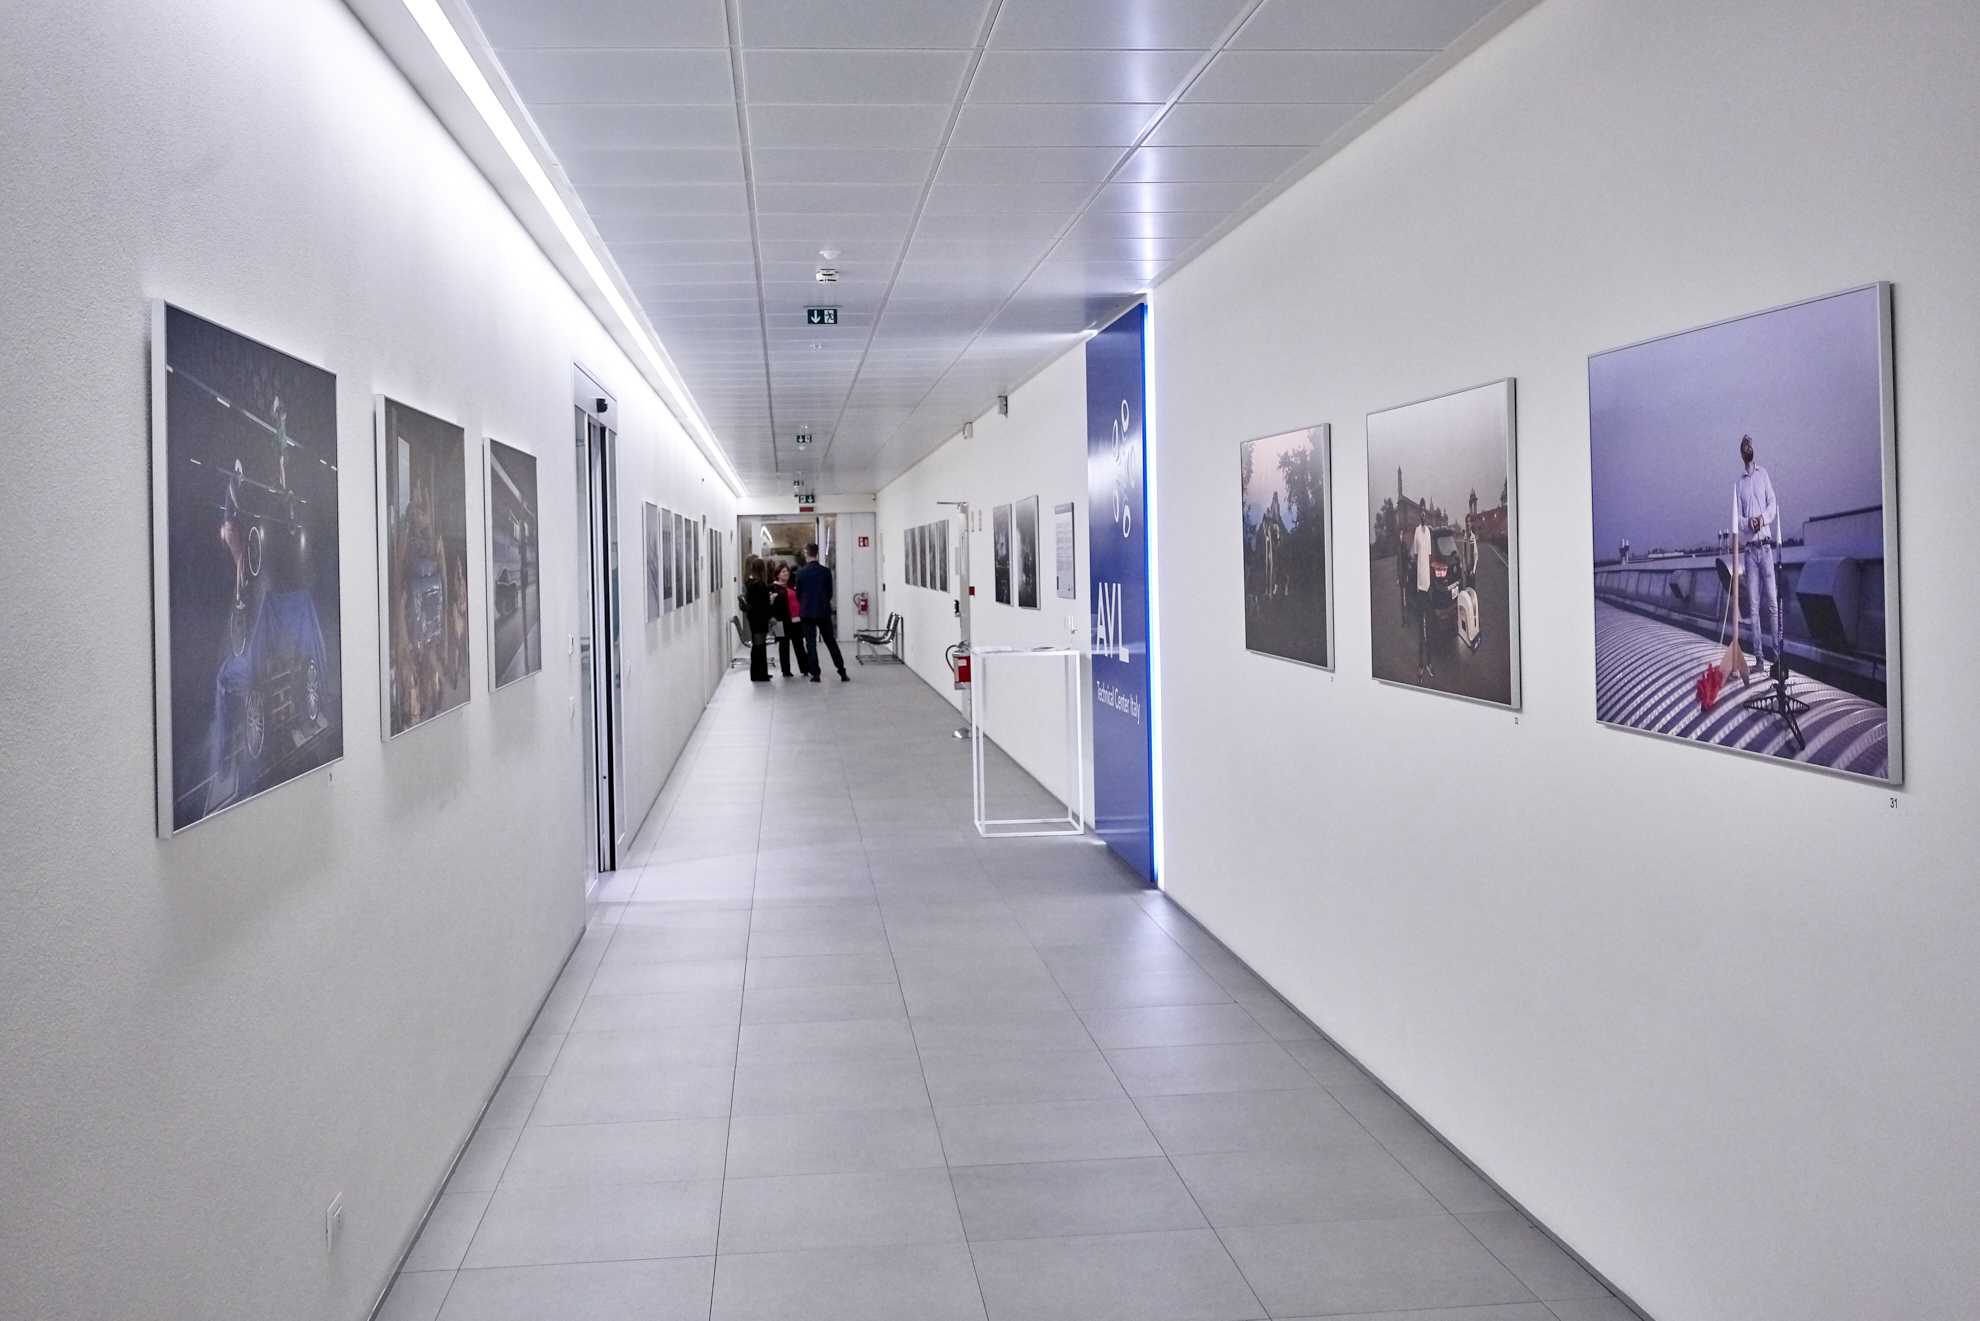 Ariane art museum date Date Ariane